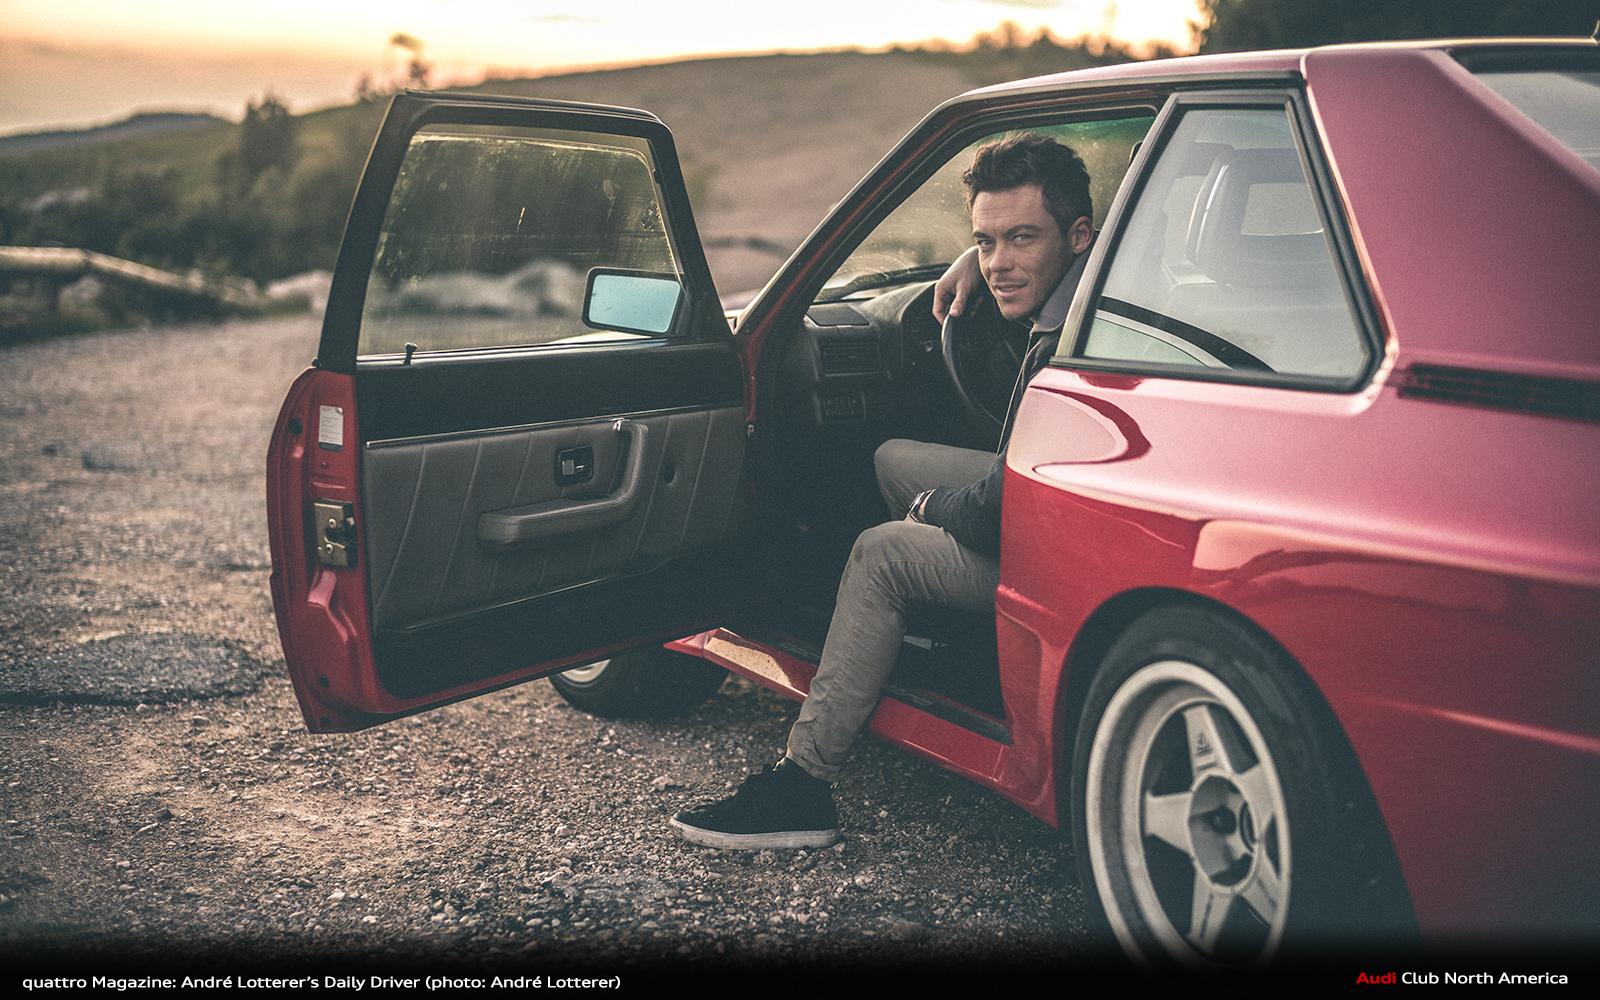 quattro Magazine: André Lotterer's Daily Driver